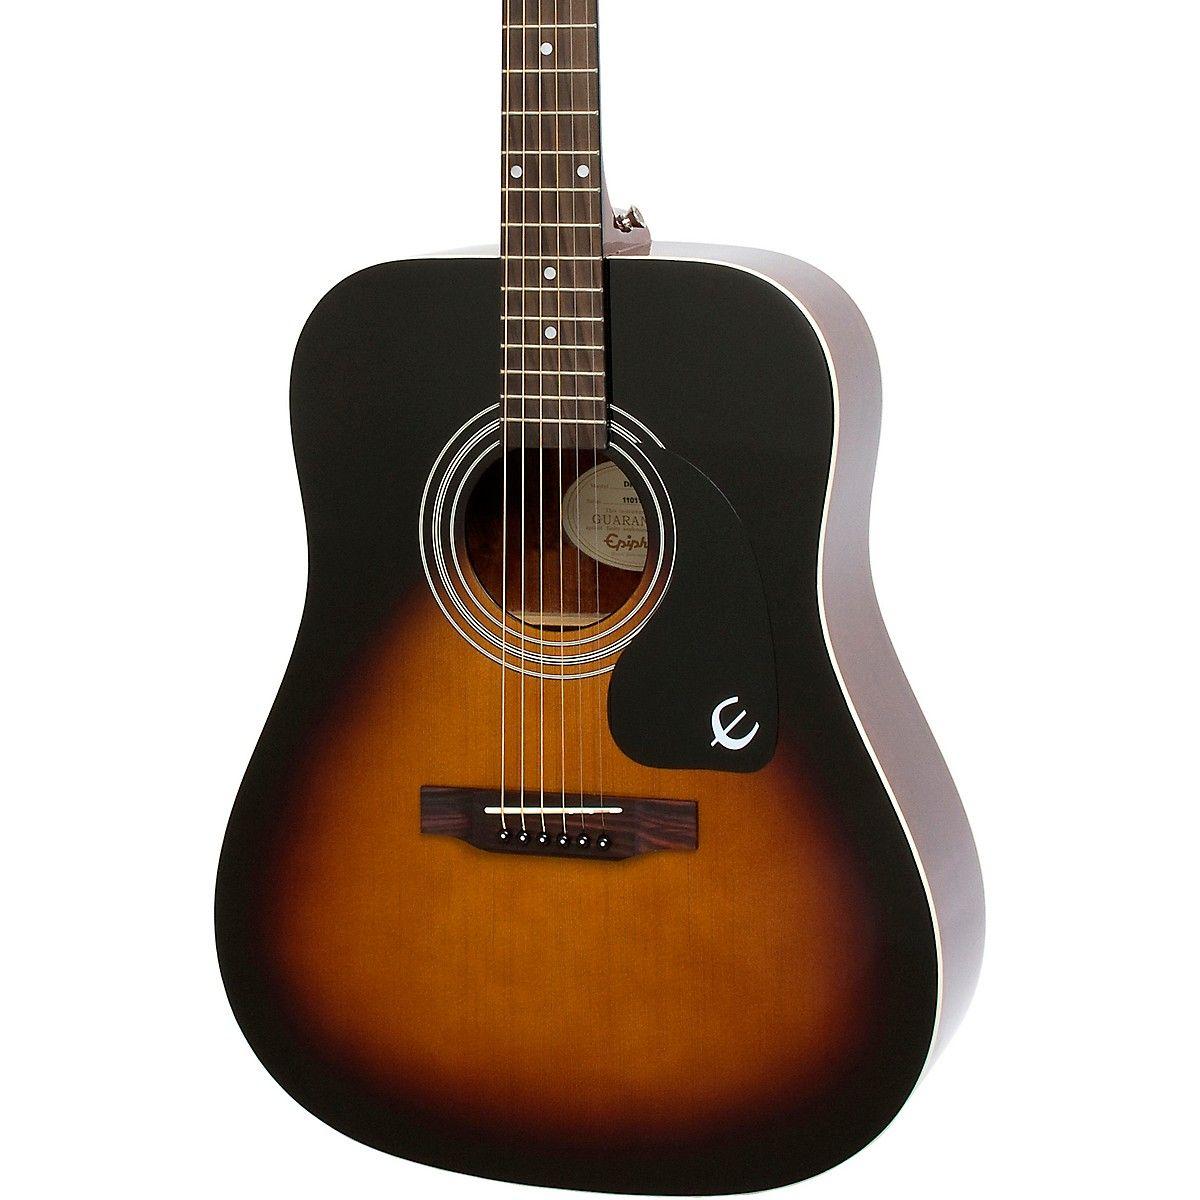 Epiphone Dr 100 Acoustic Guitar In 2020 Epiphone Guitar Acoustic Guitar